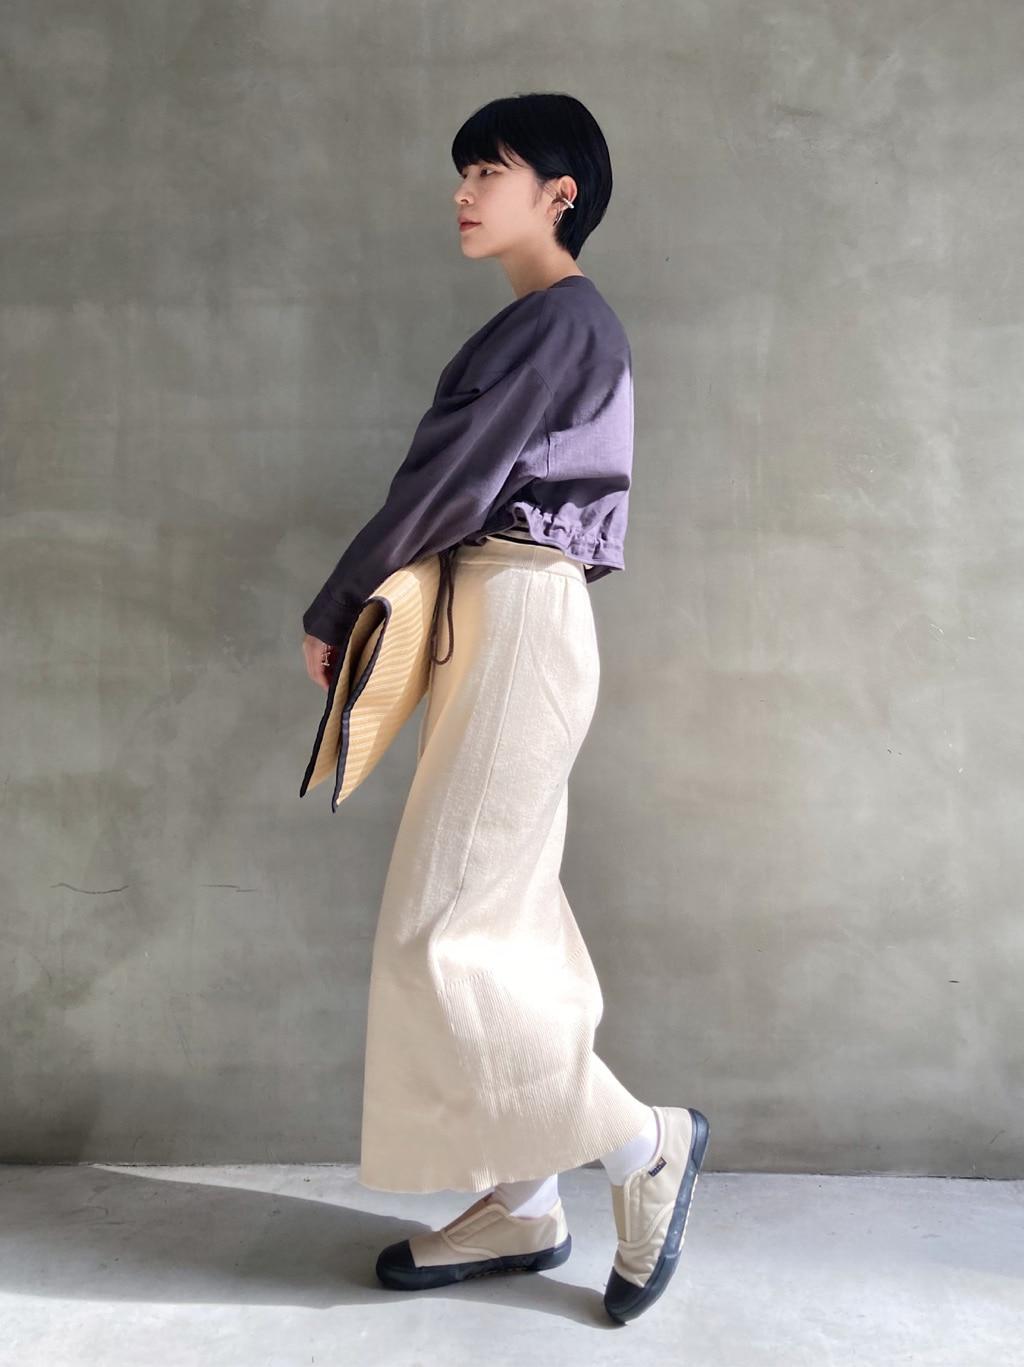 caph troupe 福岡薬院路面 身長:156cm 2021.02.10